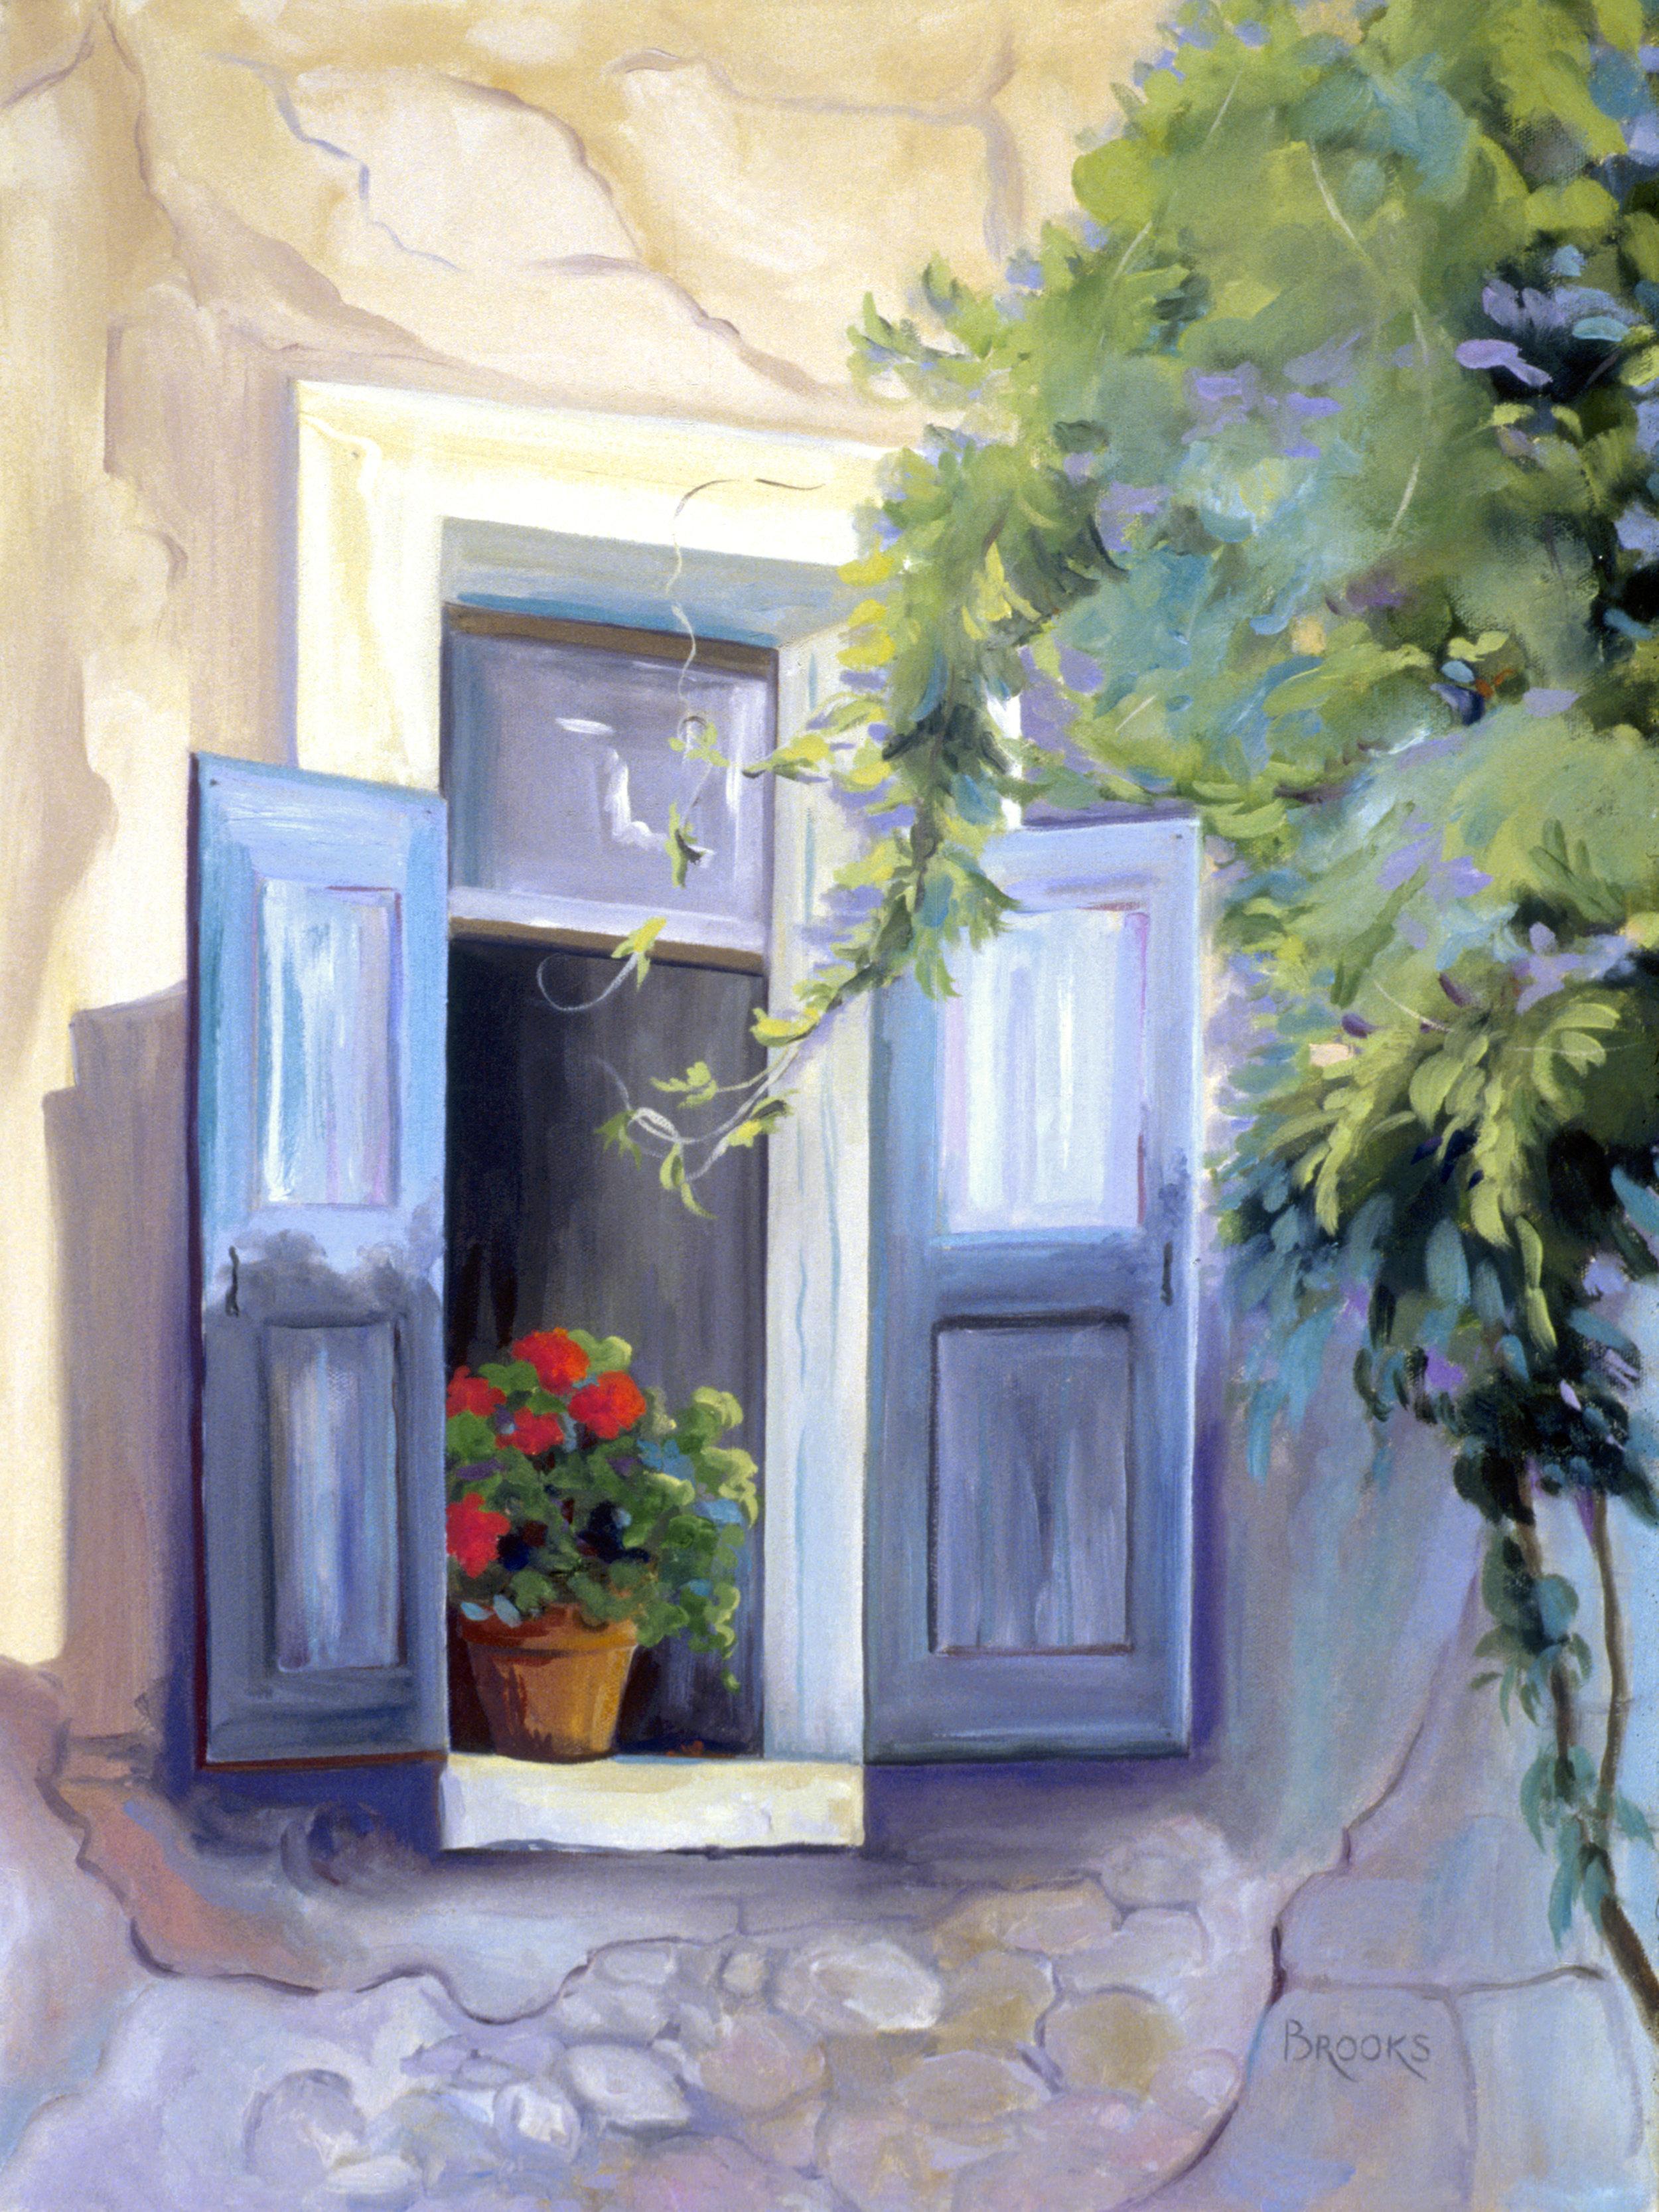 WINDOW GARDEN VIRGINIA BROOKS.jpg